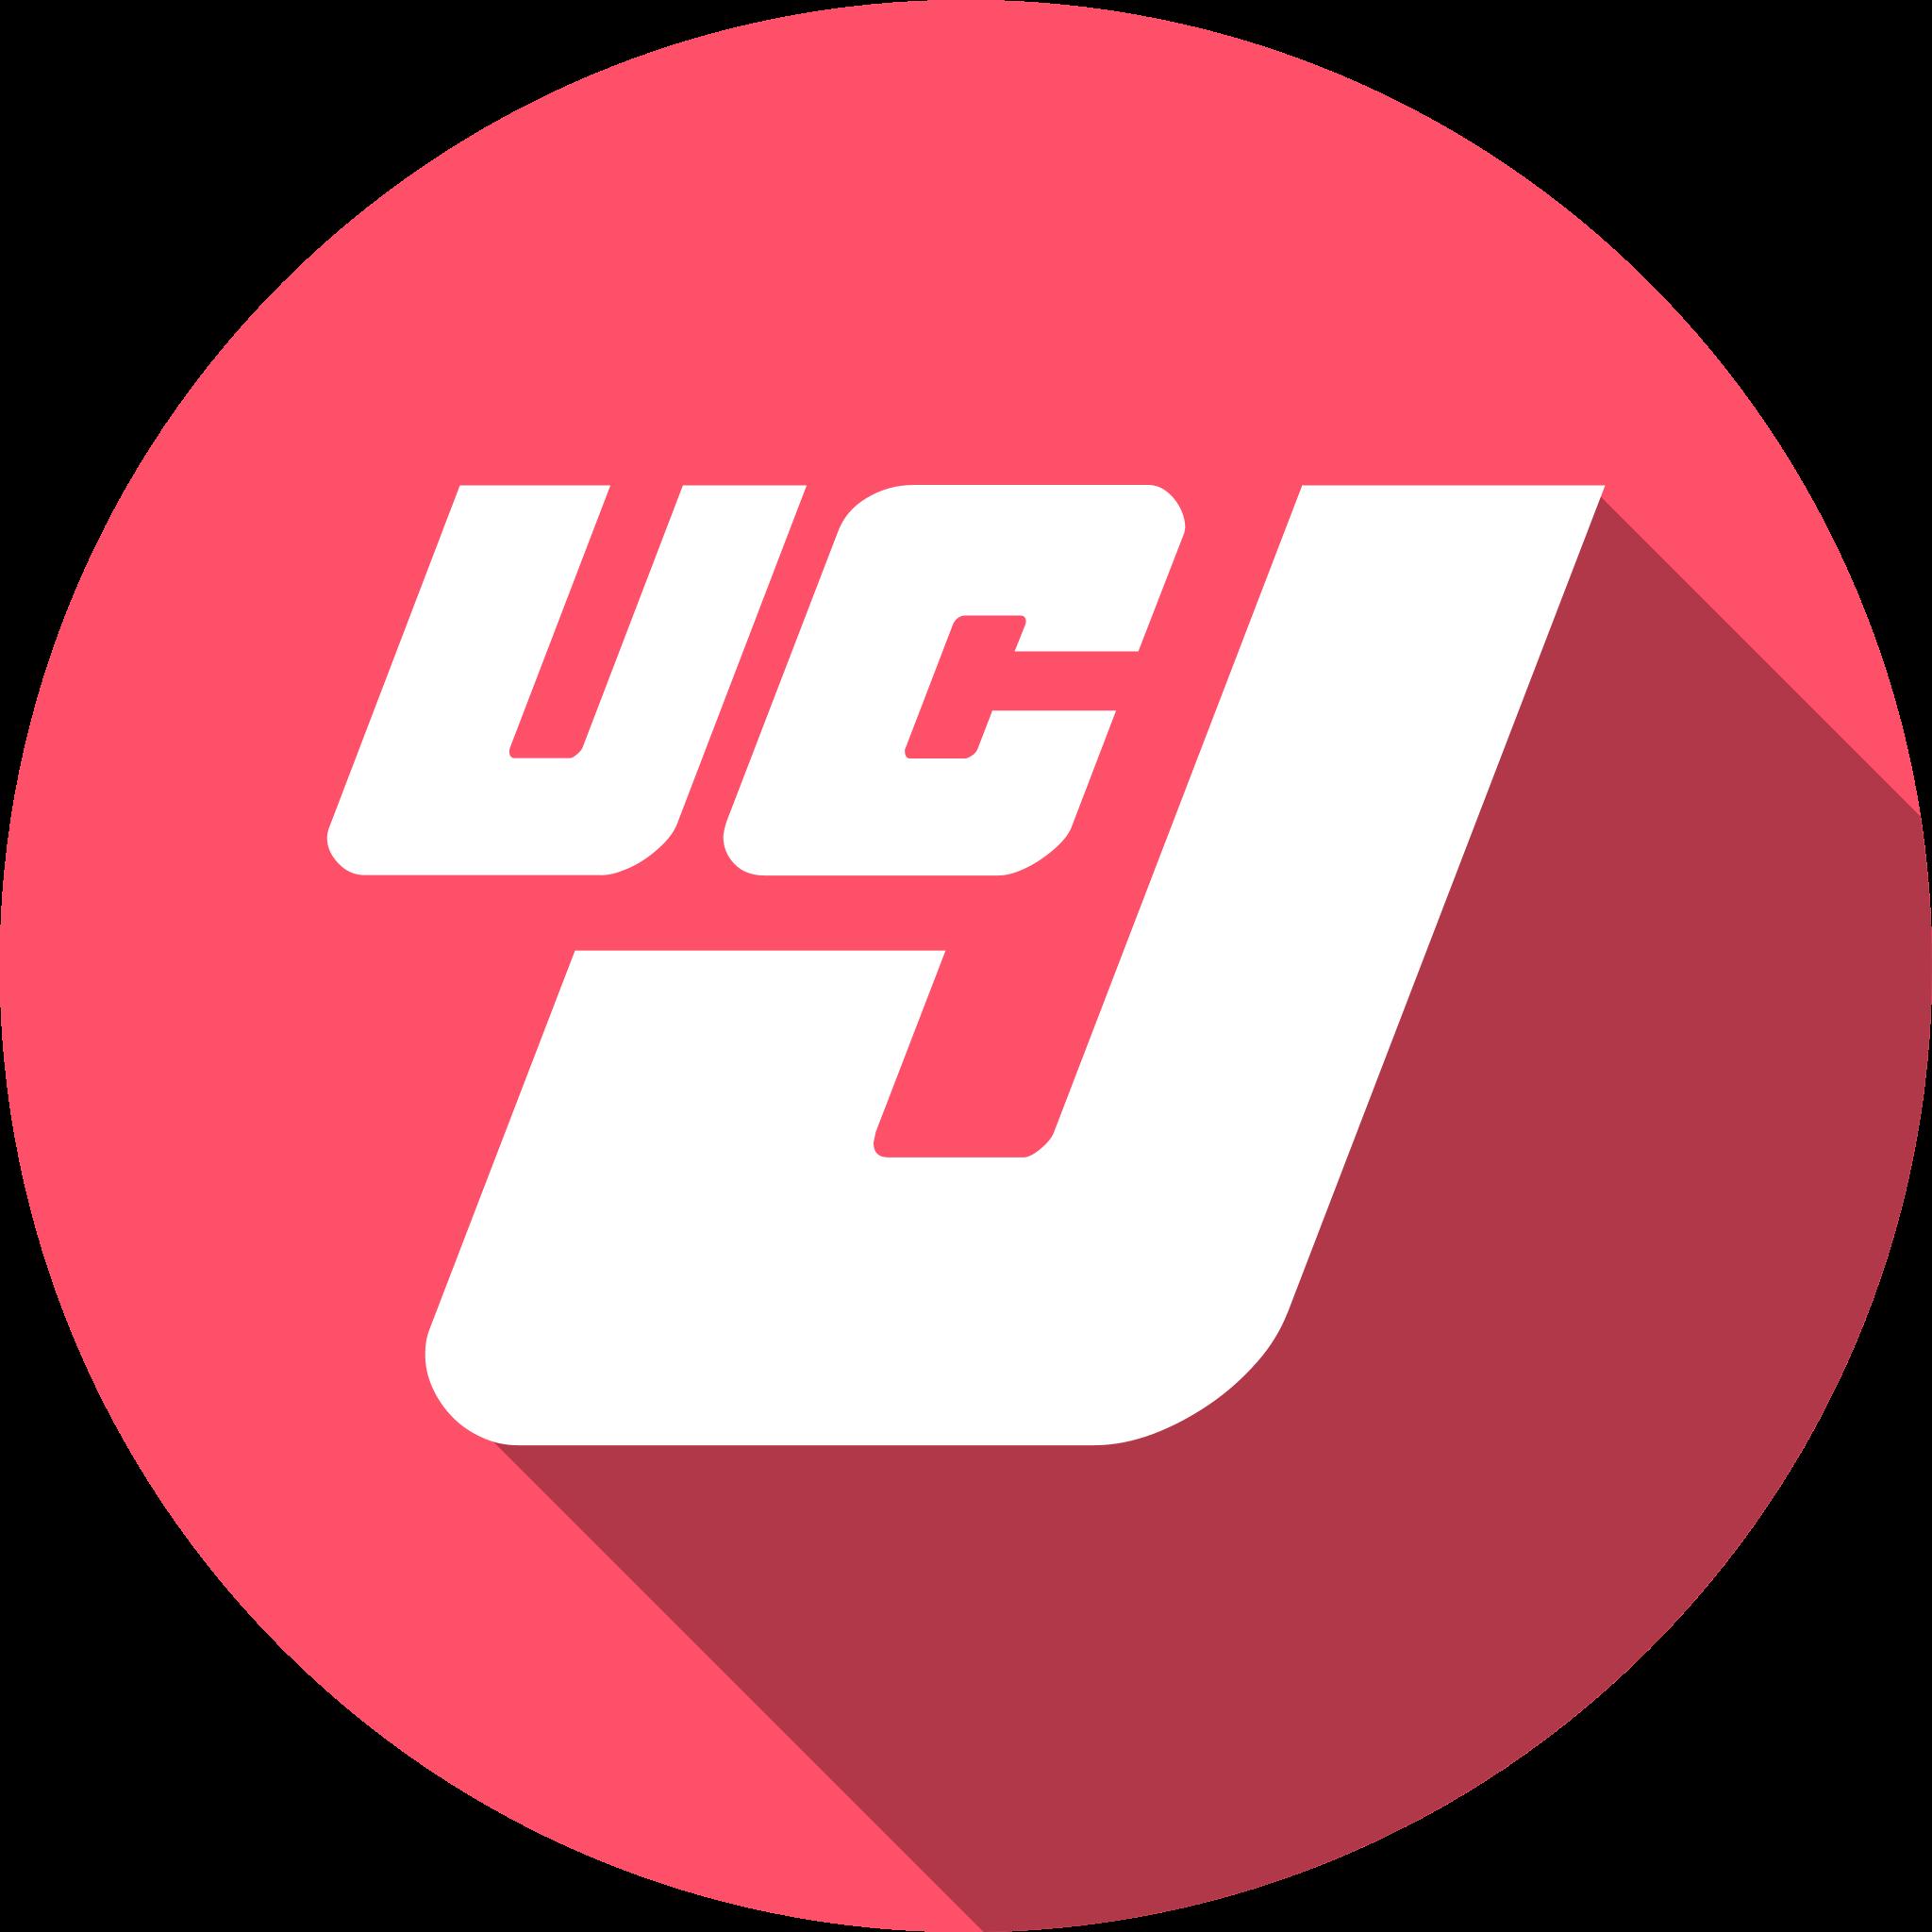 logo 标识 标志 设计 图标 2048_2048